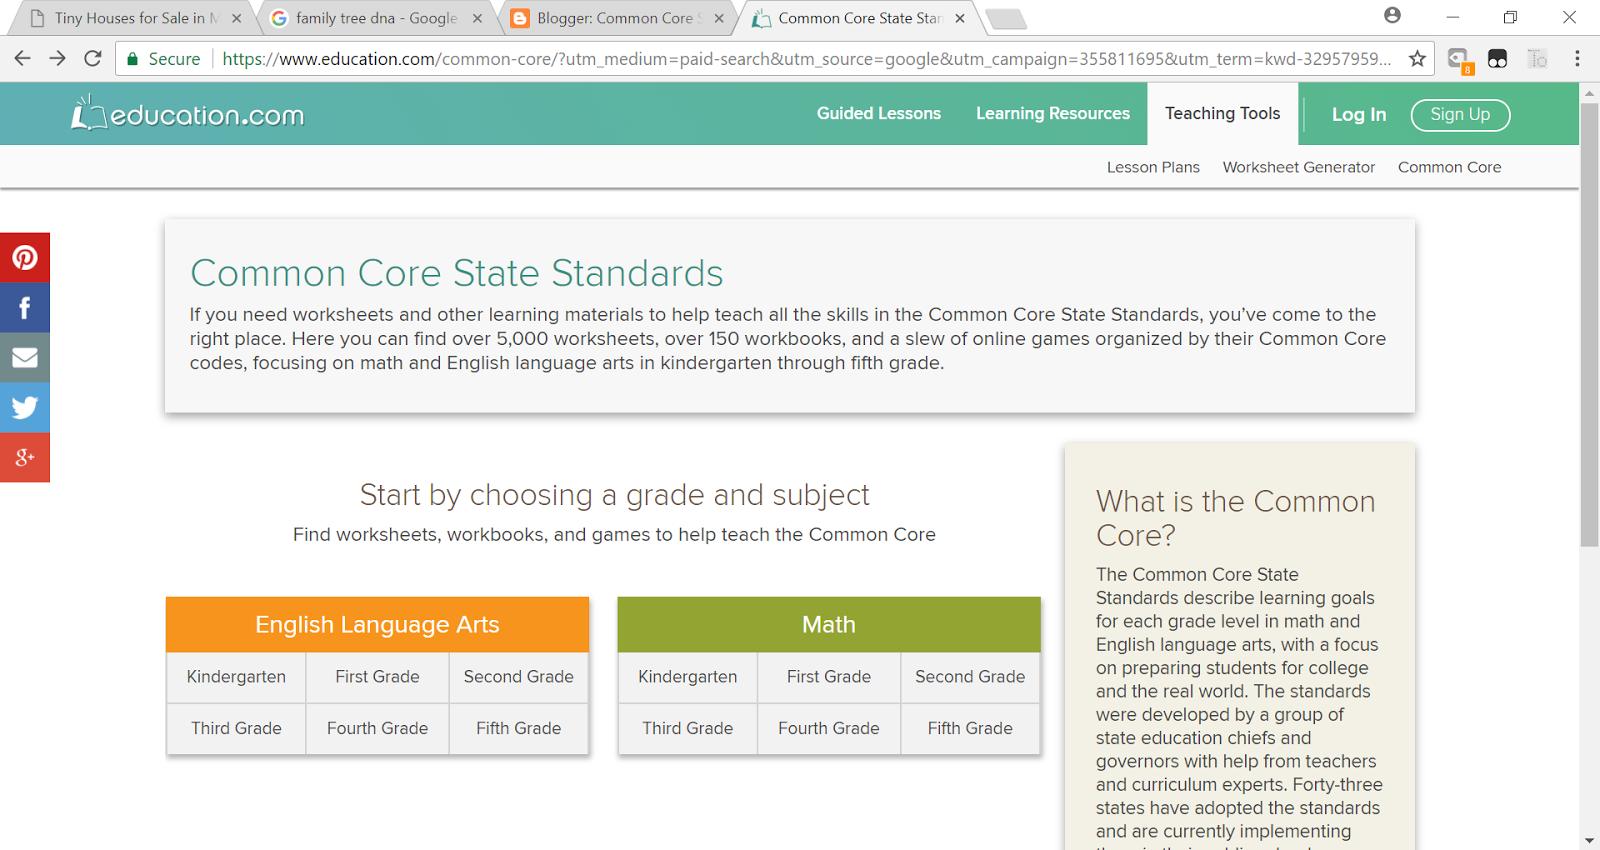 NCSM CCSSM Curriculum Analysis Tool | Common Core State Standards CCSS